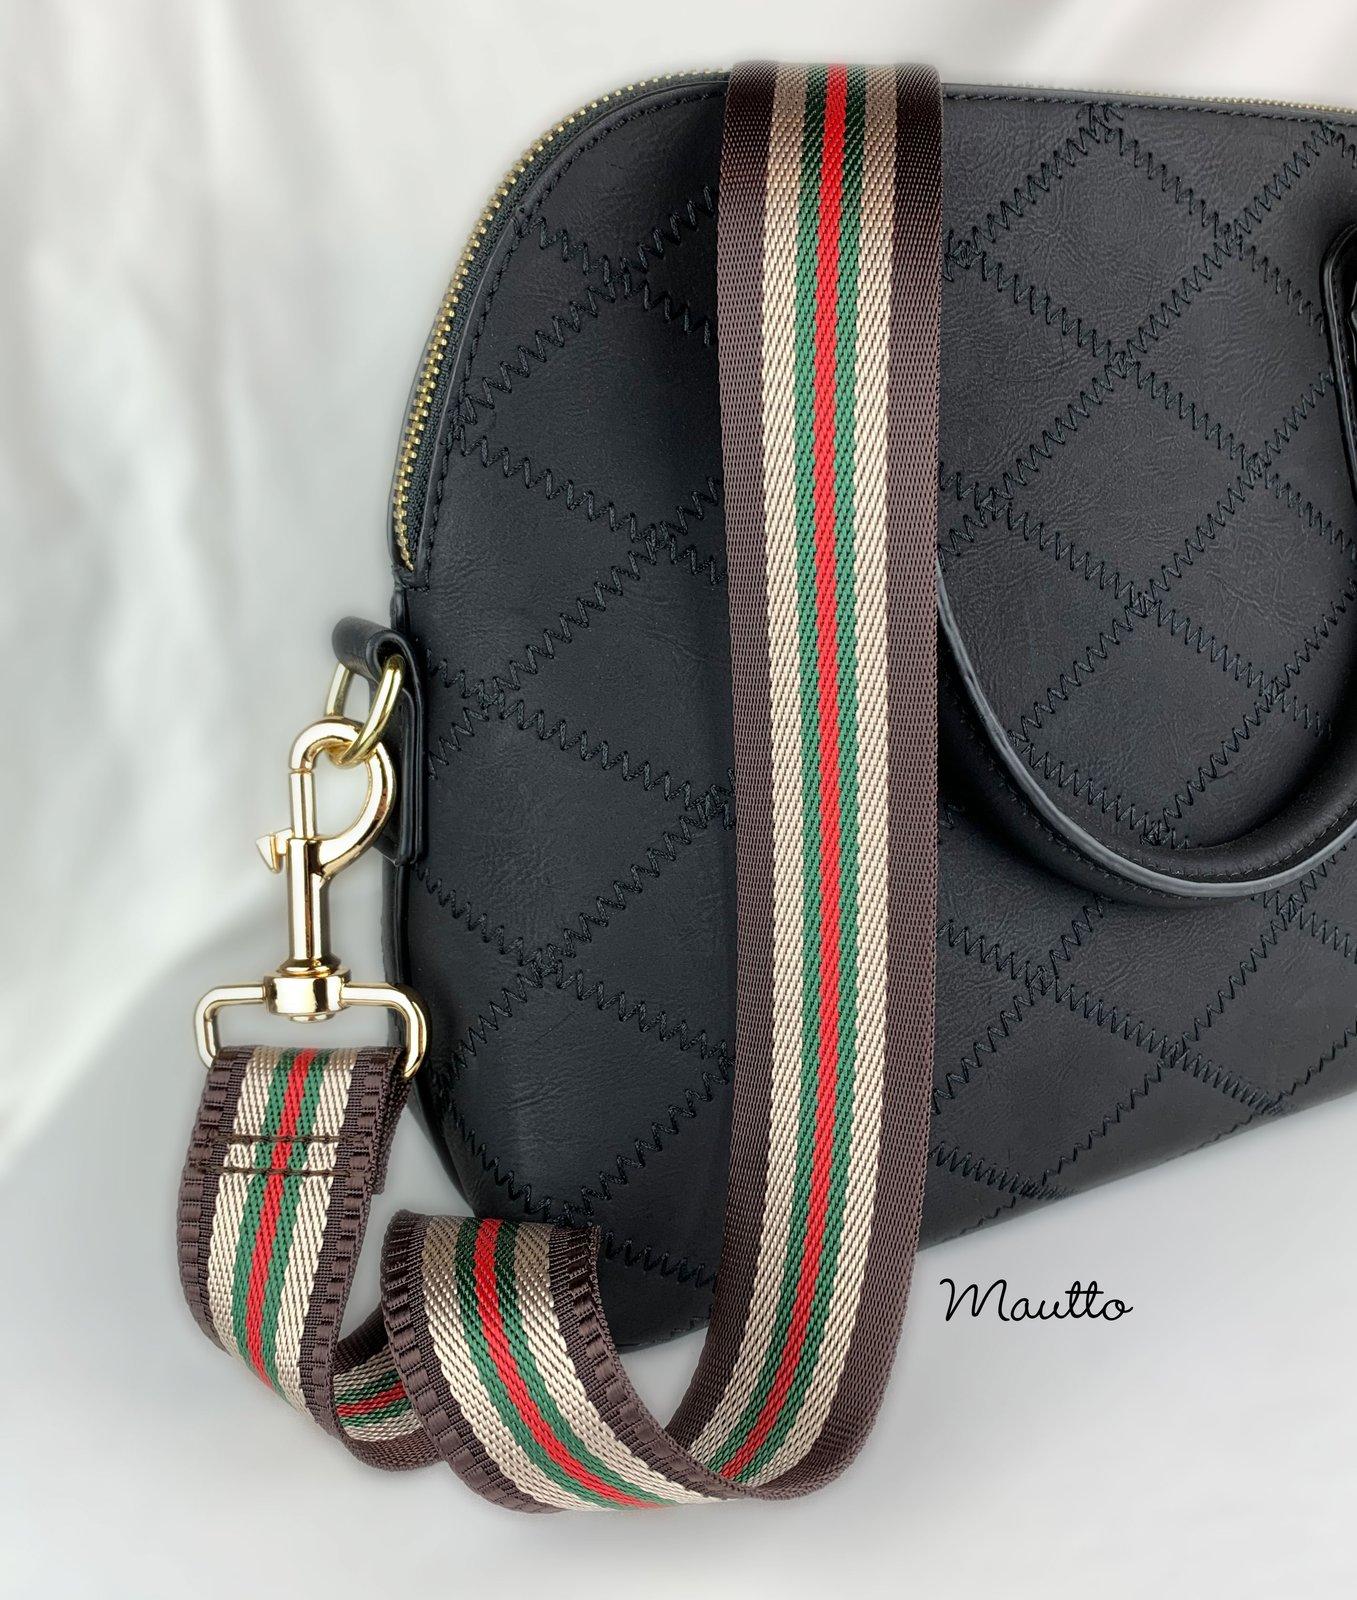 Stripe Webbing Shoulder Bag Chain Wide Crossbody Chain Strap Me609 New Cotton Canvas Purse Strap 2 5cm